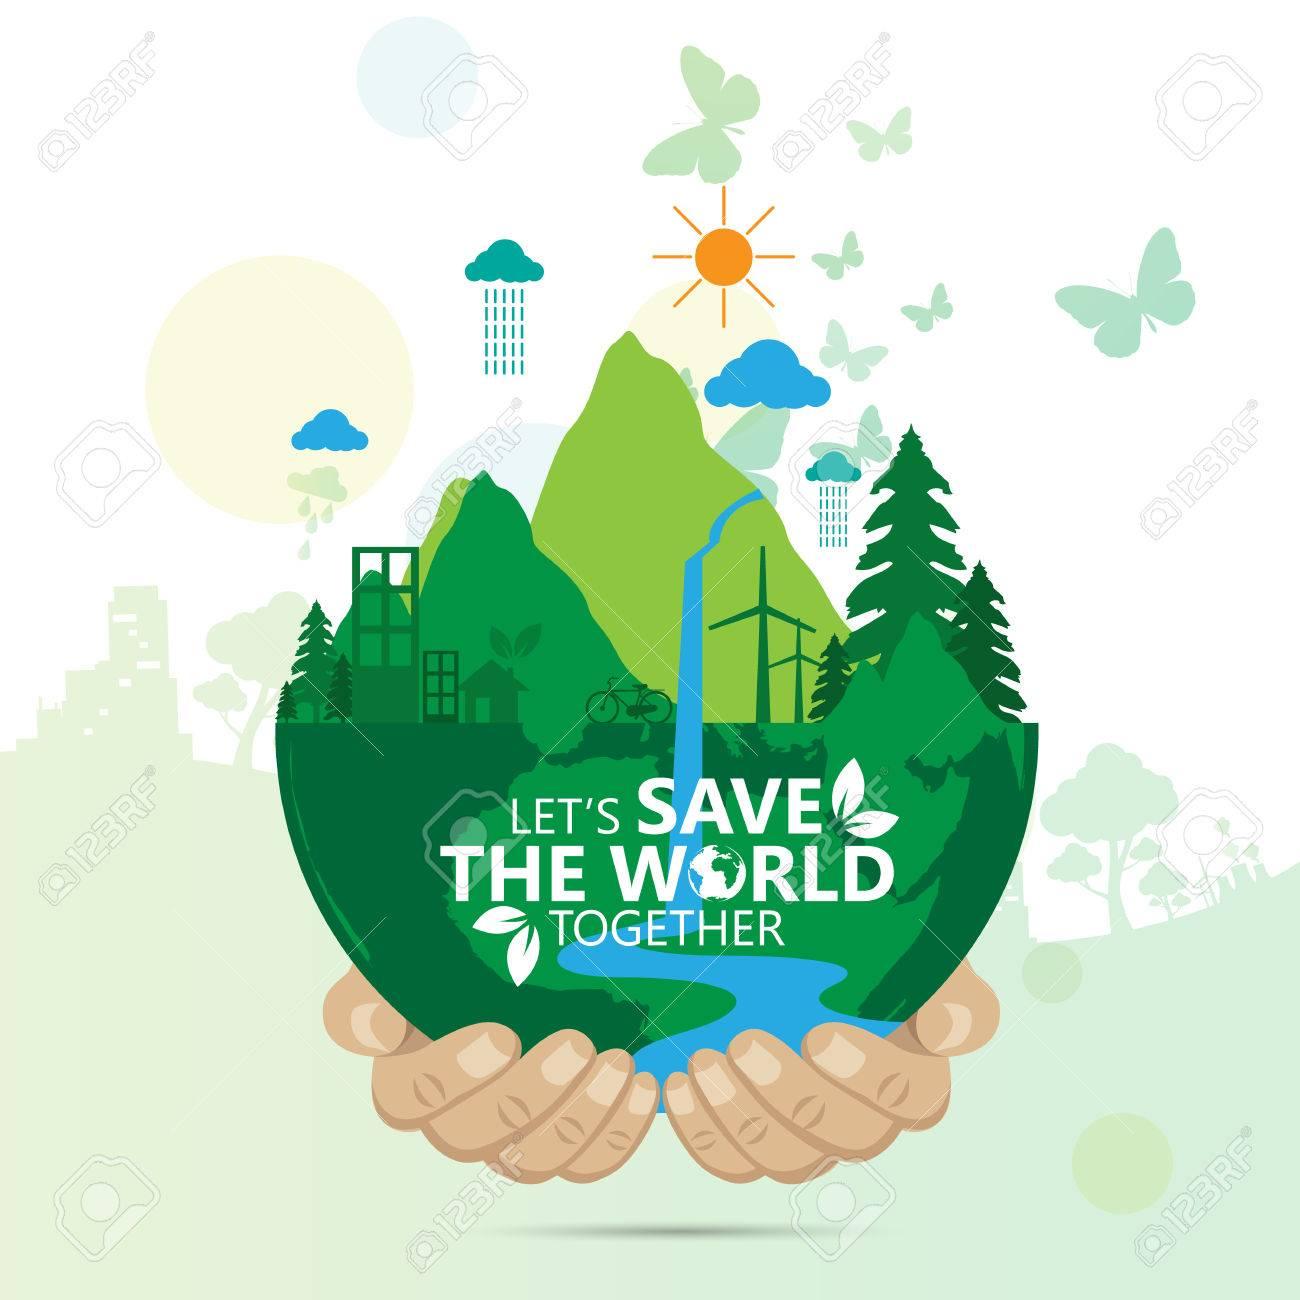 save the world - 44093259